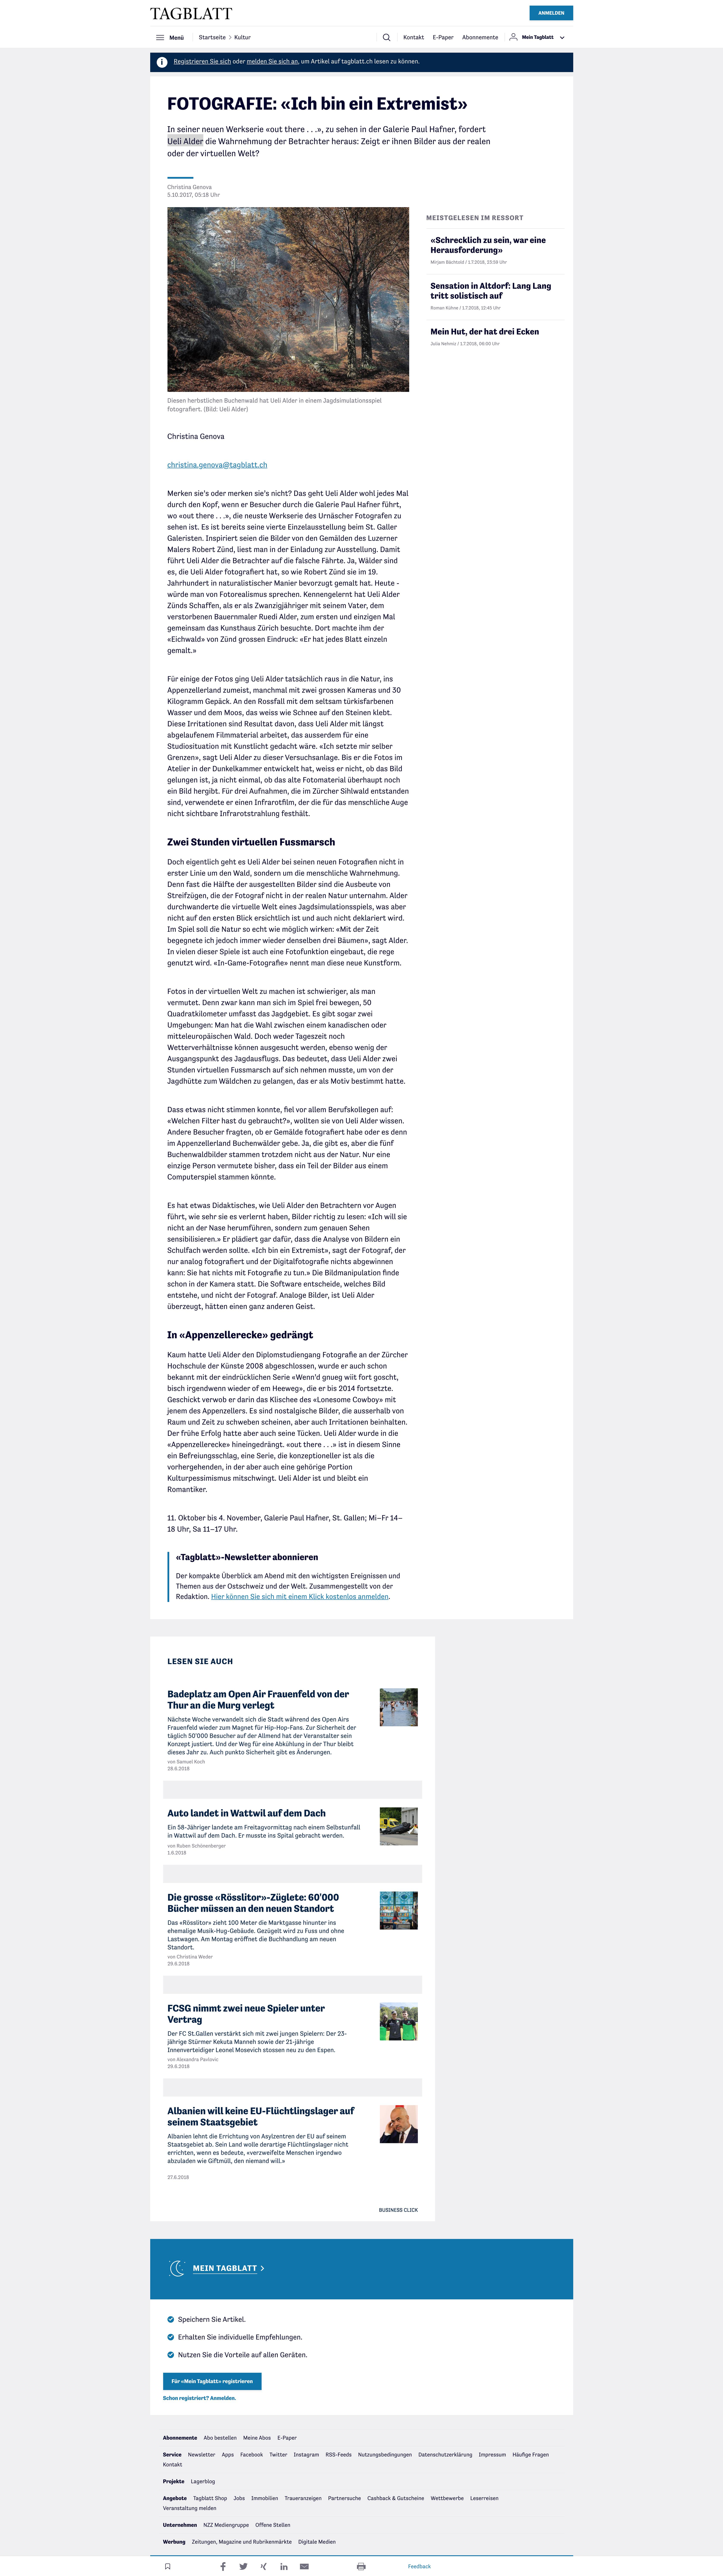 screencapture-tagblatt-ch-kultur-fotografie-ich-bin-ein-extremist-ld-917059-2018-07-02-23_22_59.png